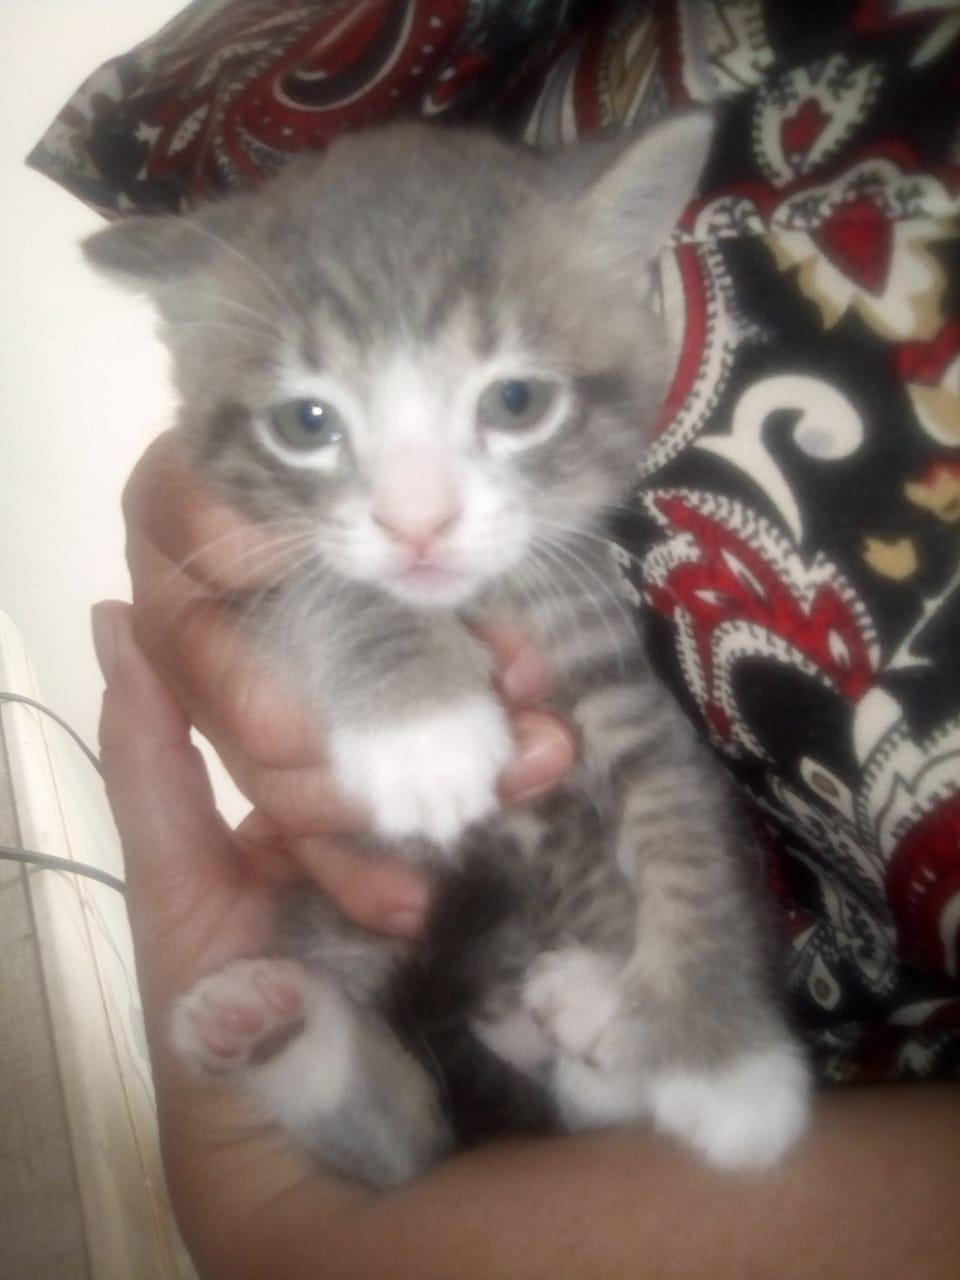 5 little kittens